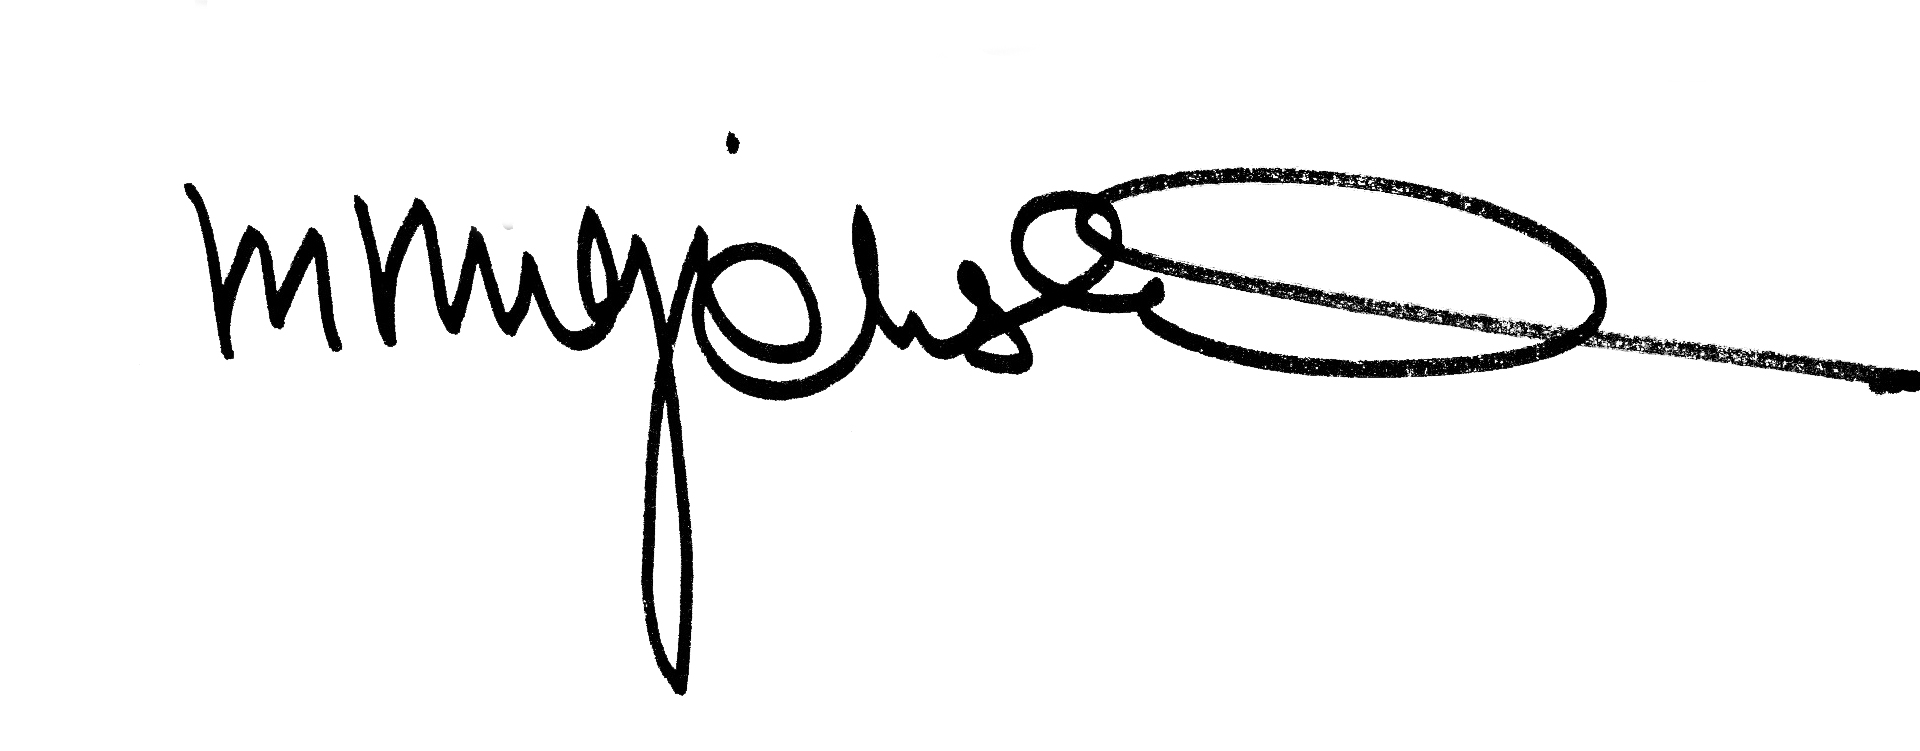 Margo MajEWSKA Signature